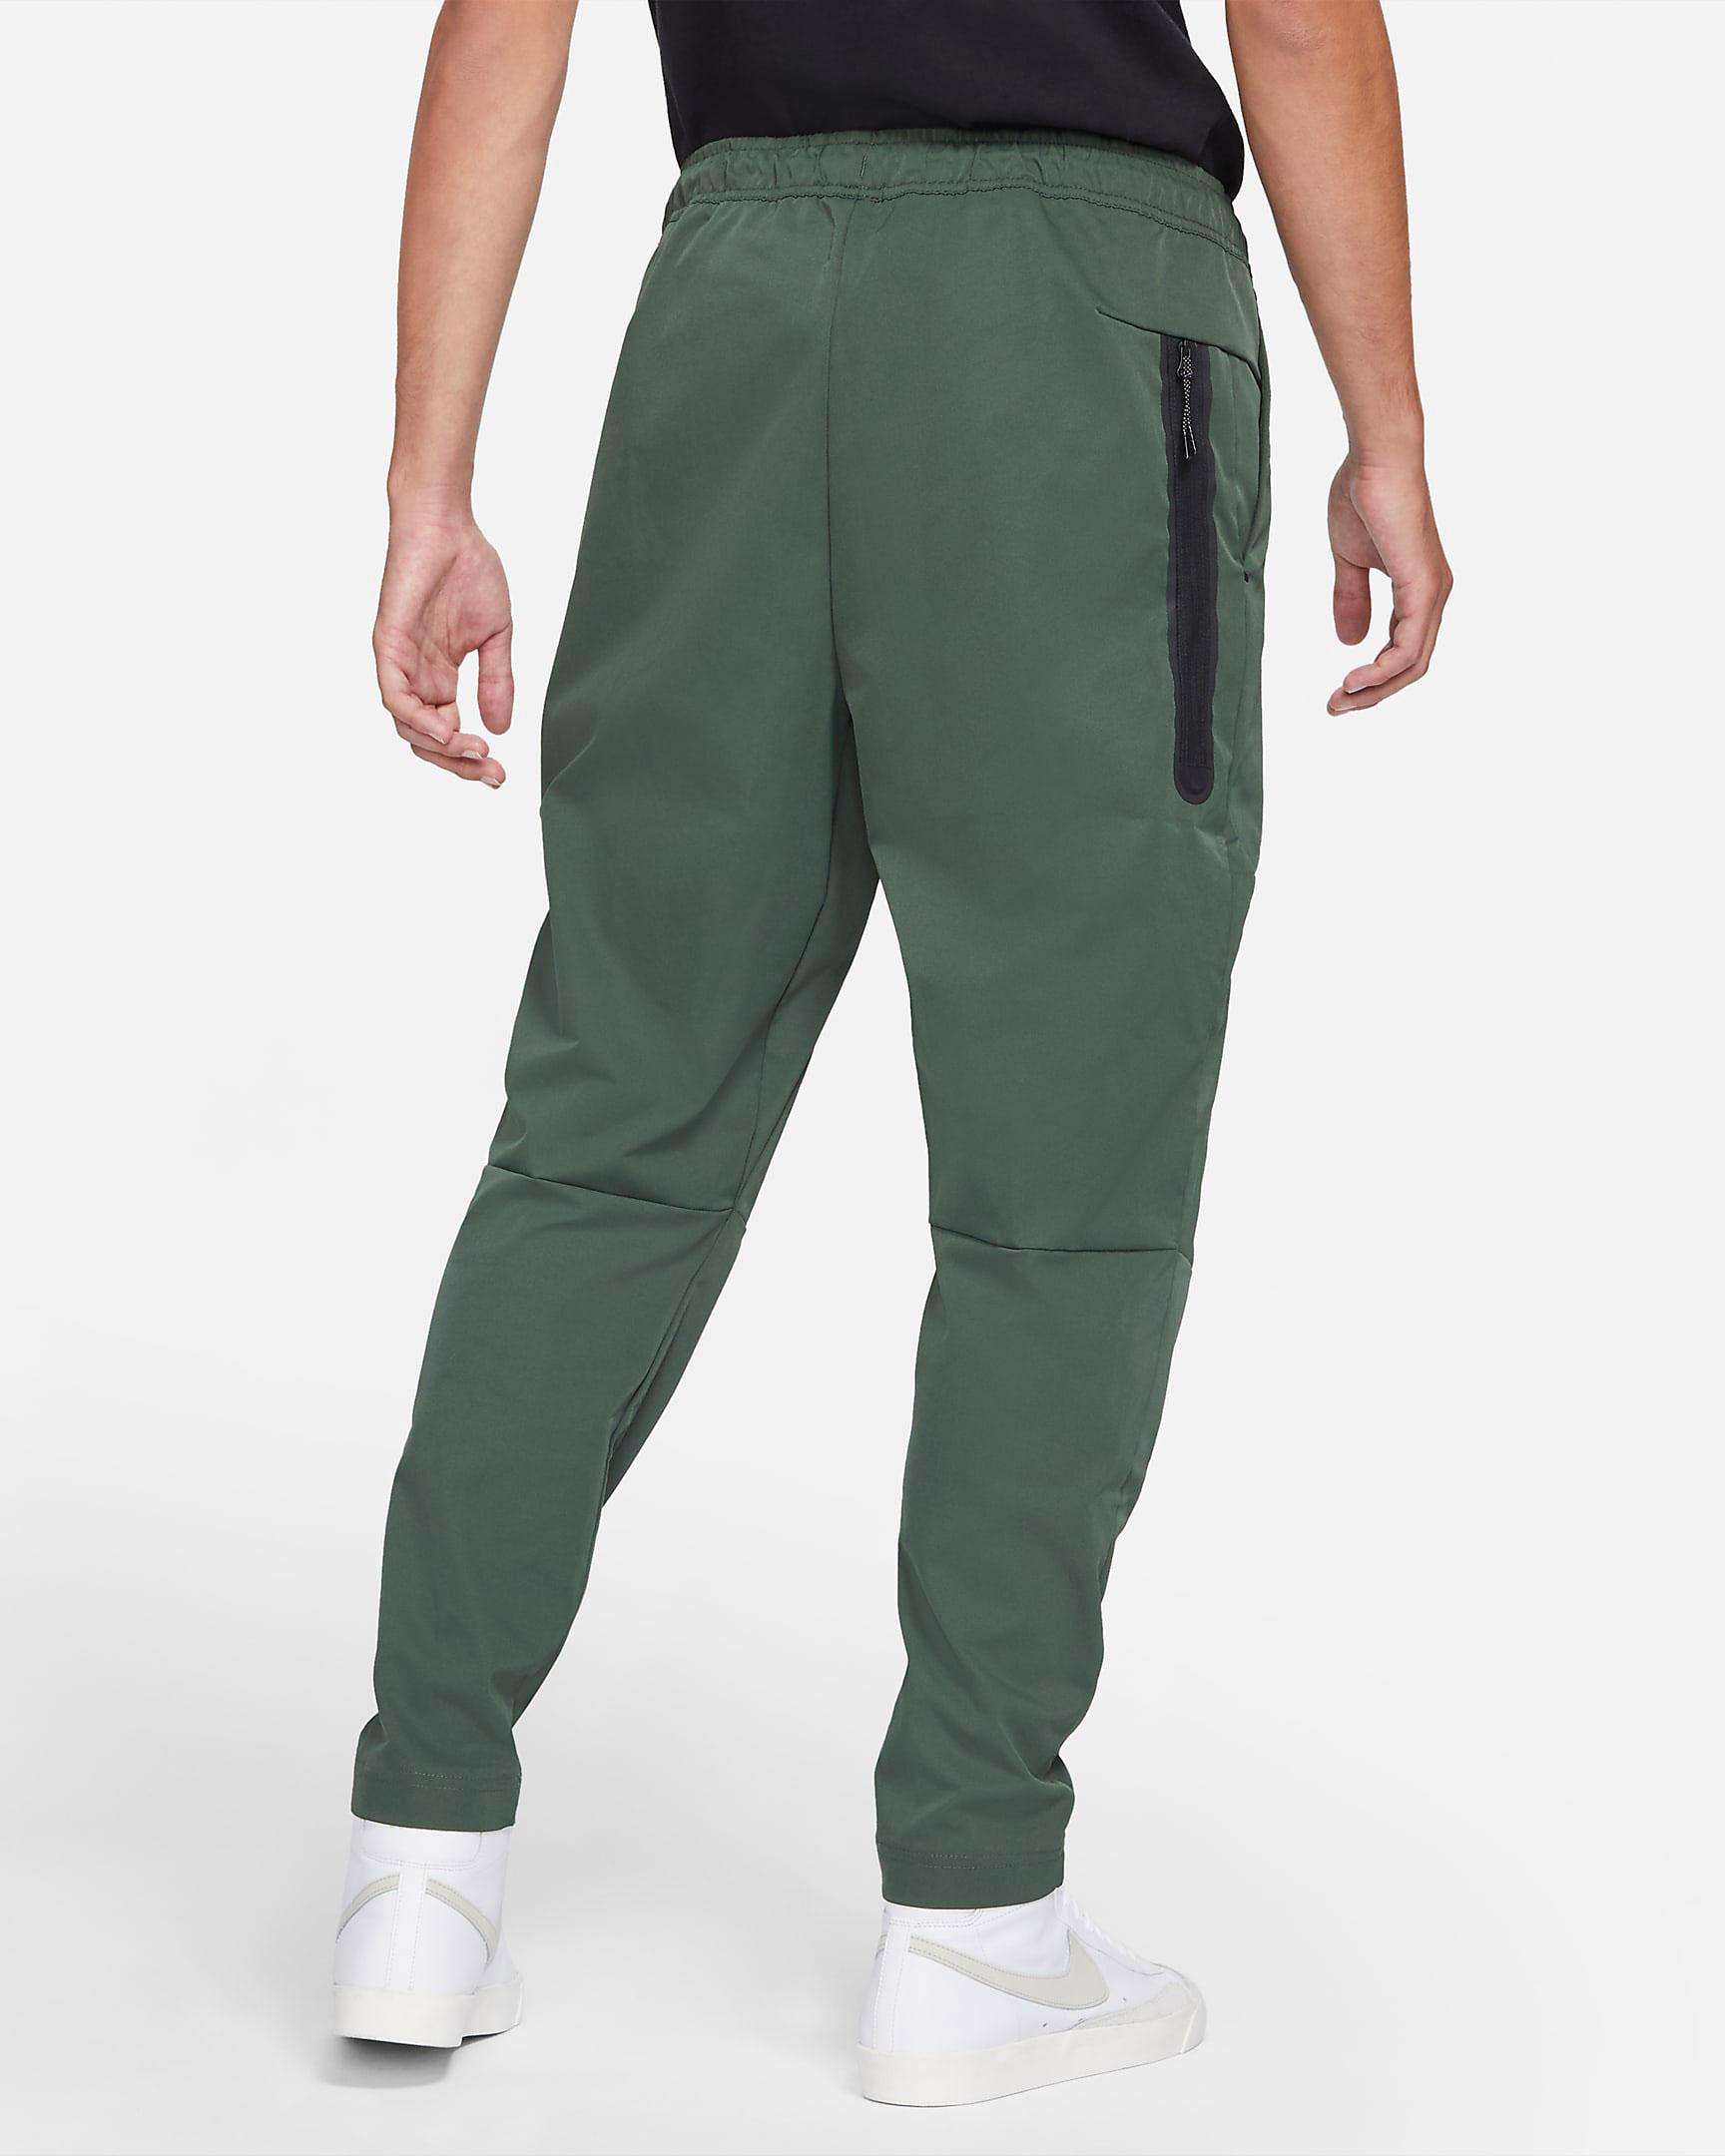 nike-galactic-jade-woven-pants-2